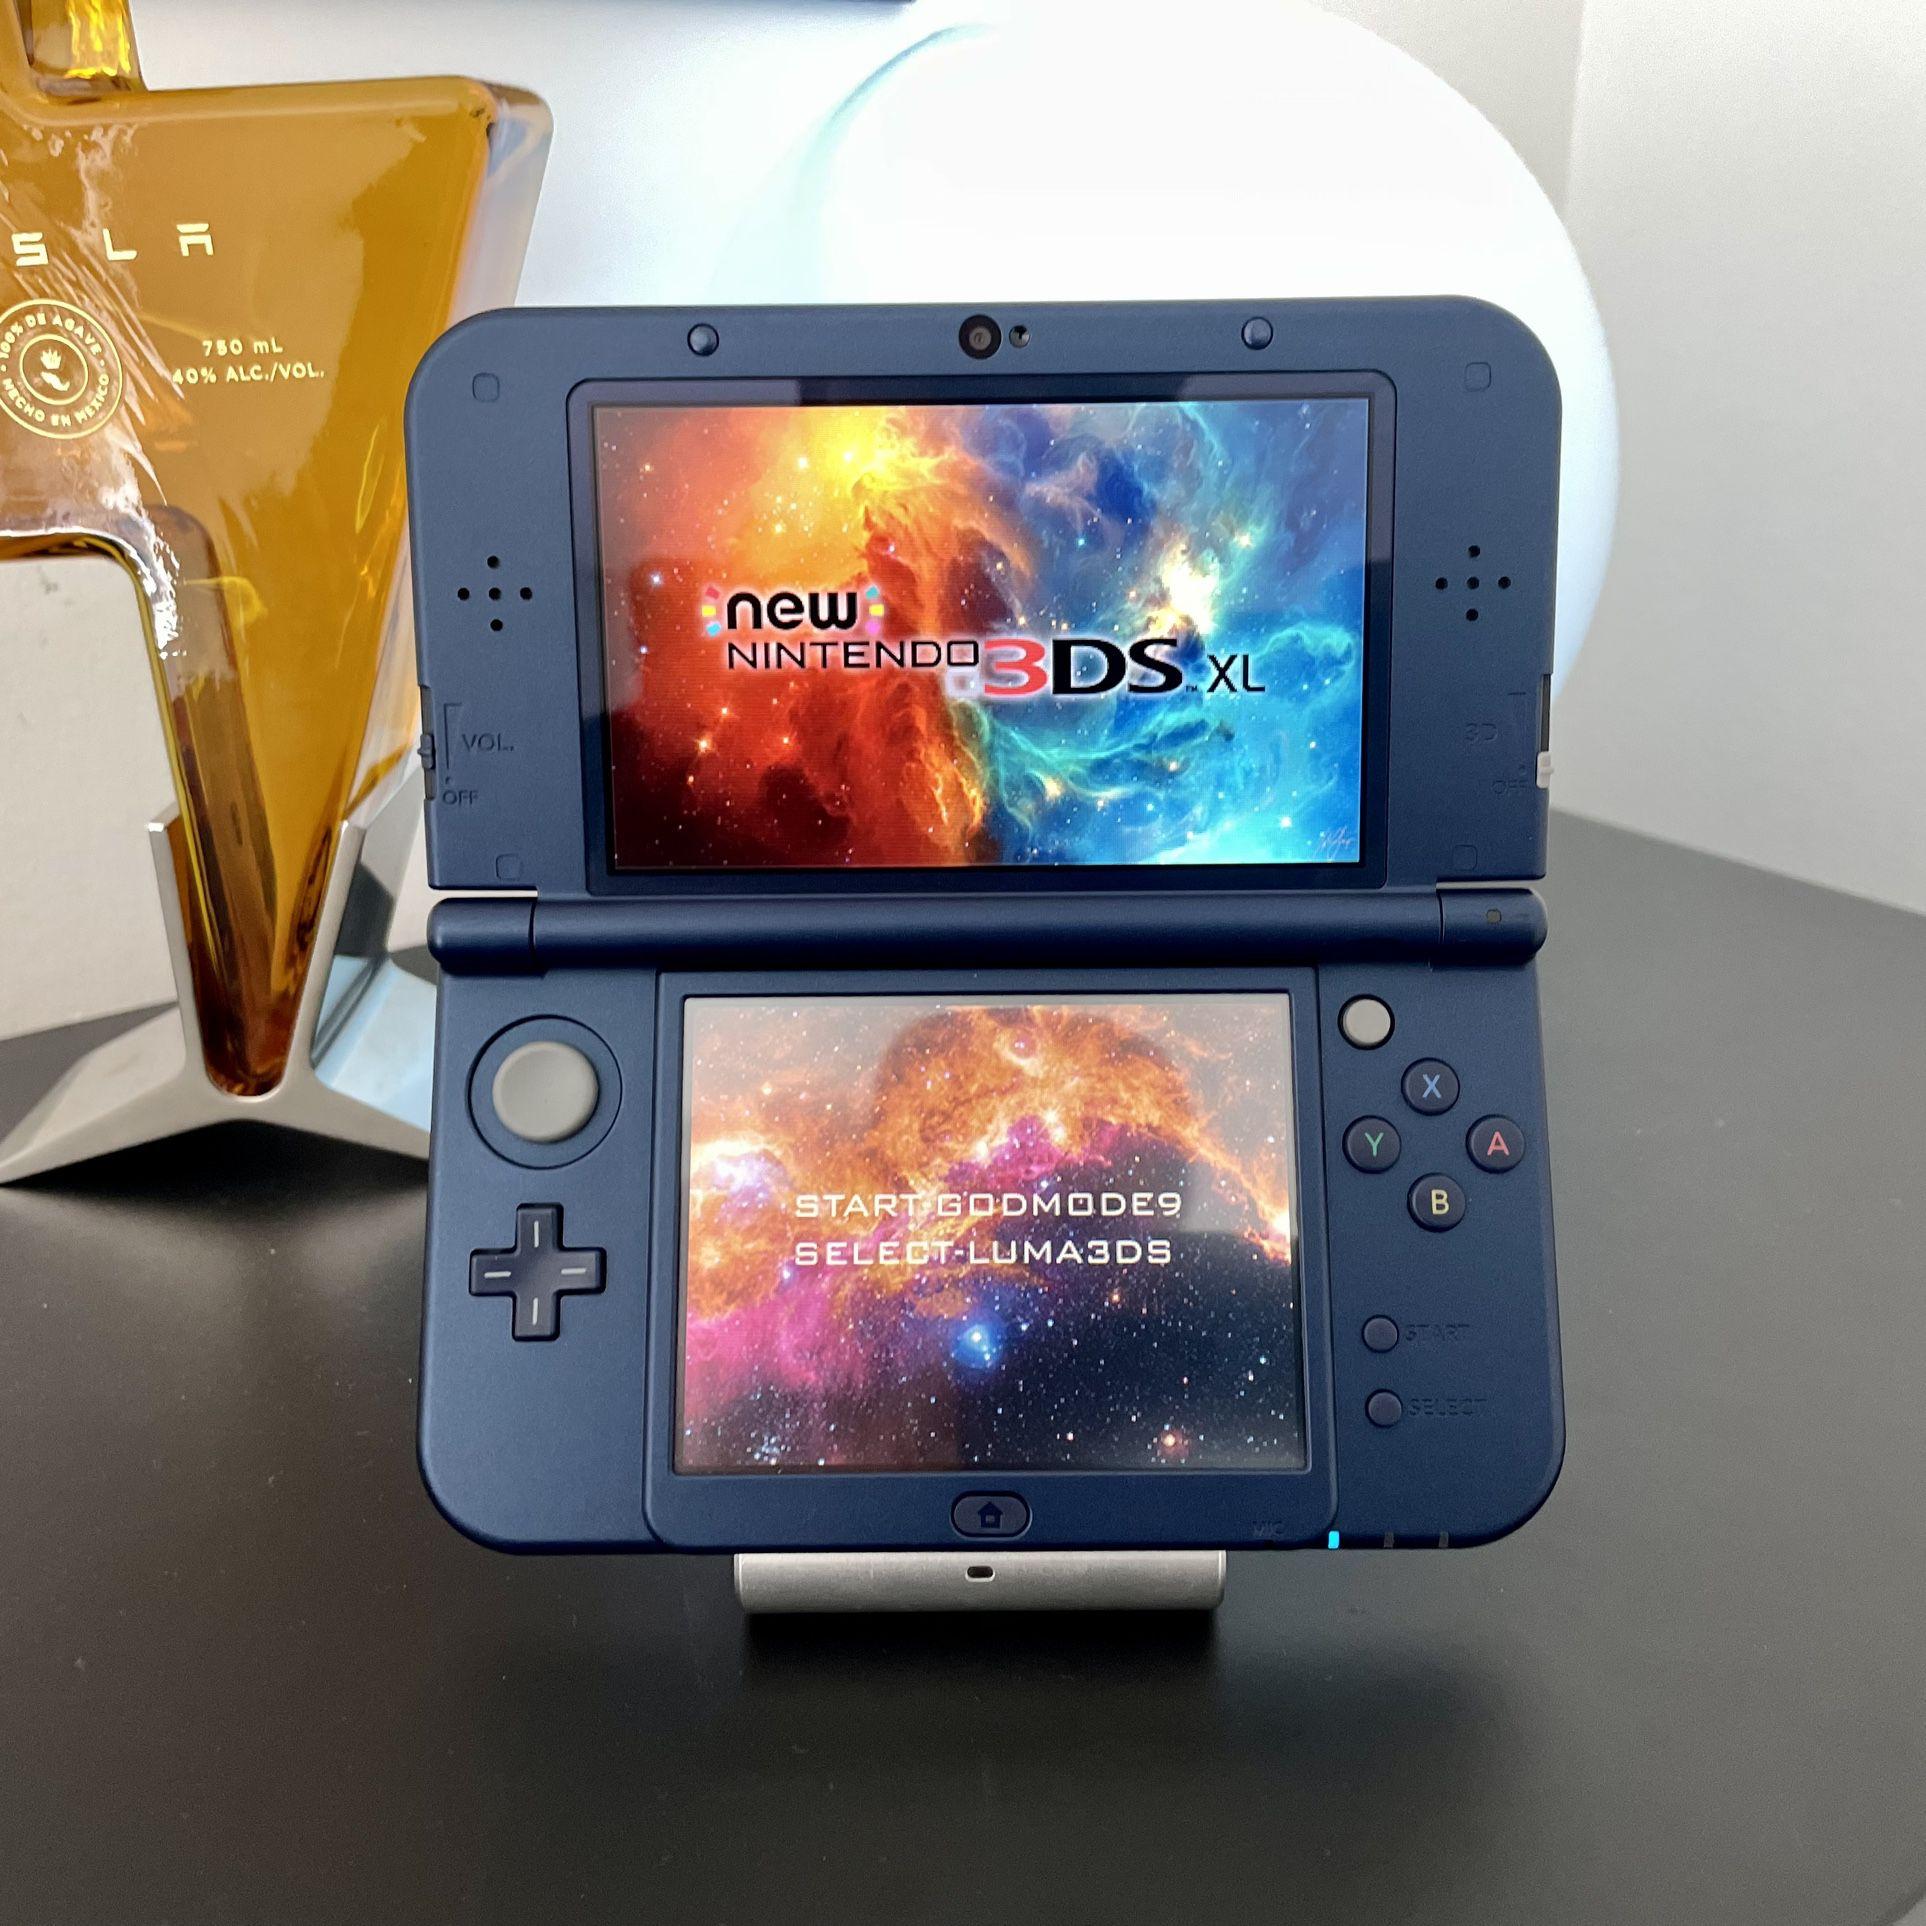 New Nintendo 3DS Metallic Blue W/ 128gb of Games